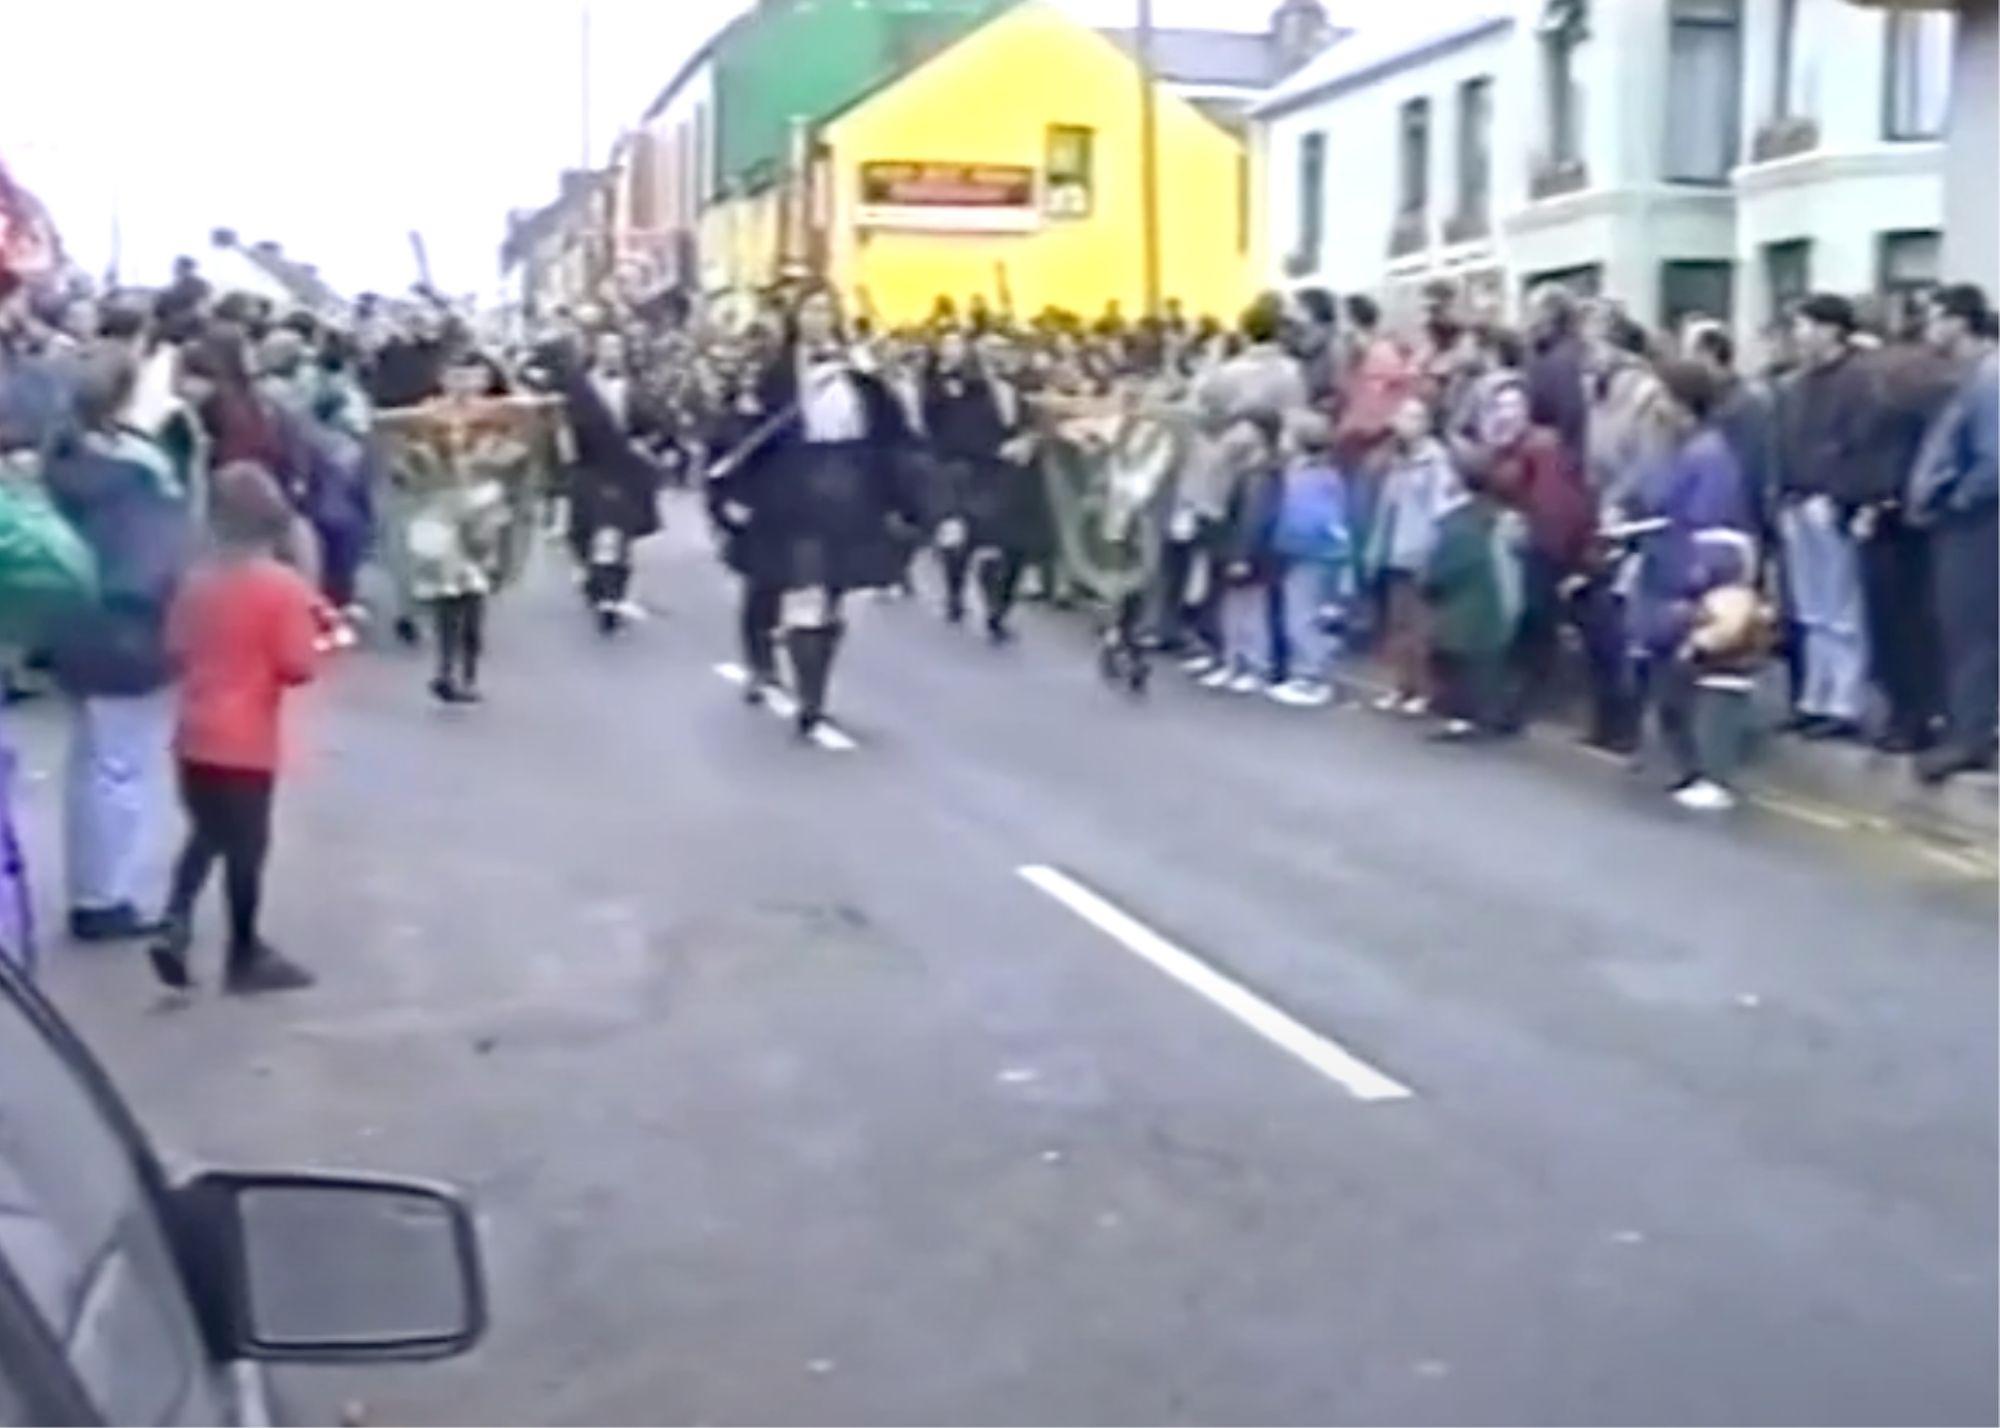 1993 St Patrick's Day parade Bundoran st patricks day nostalgia